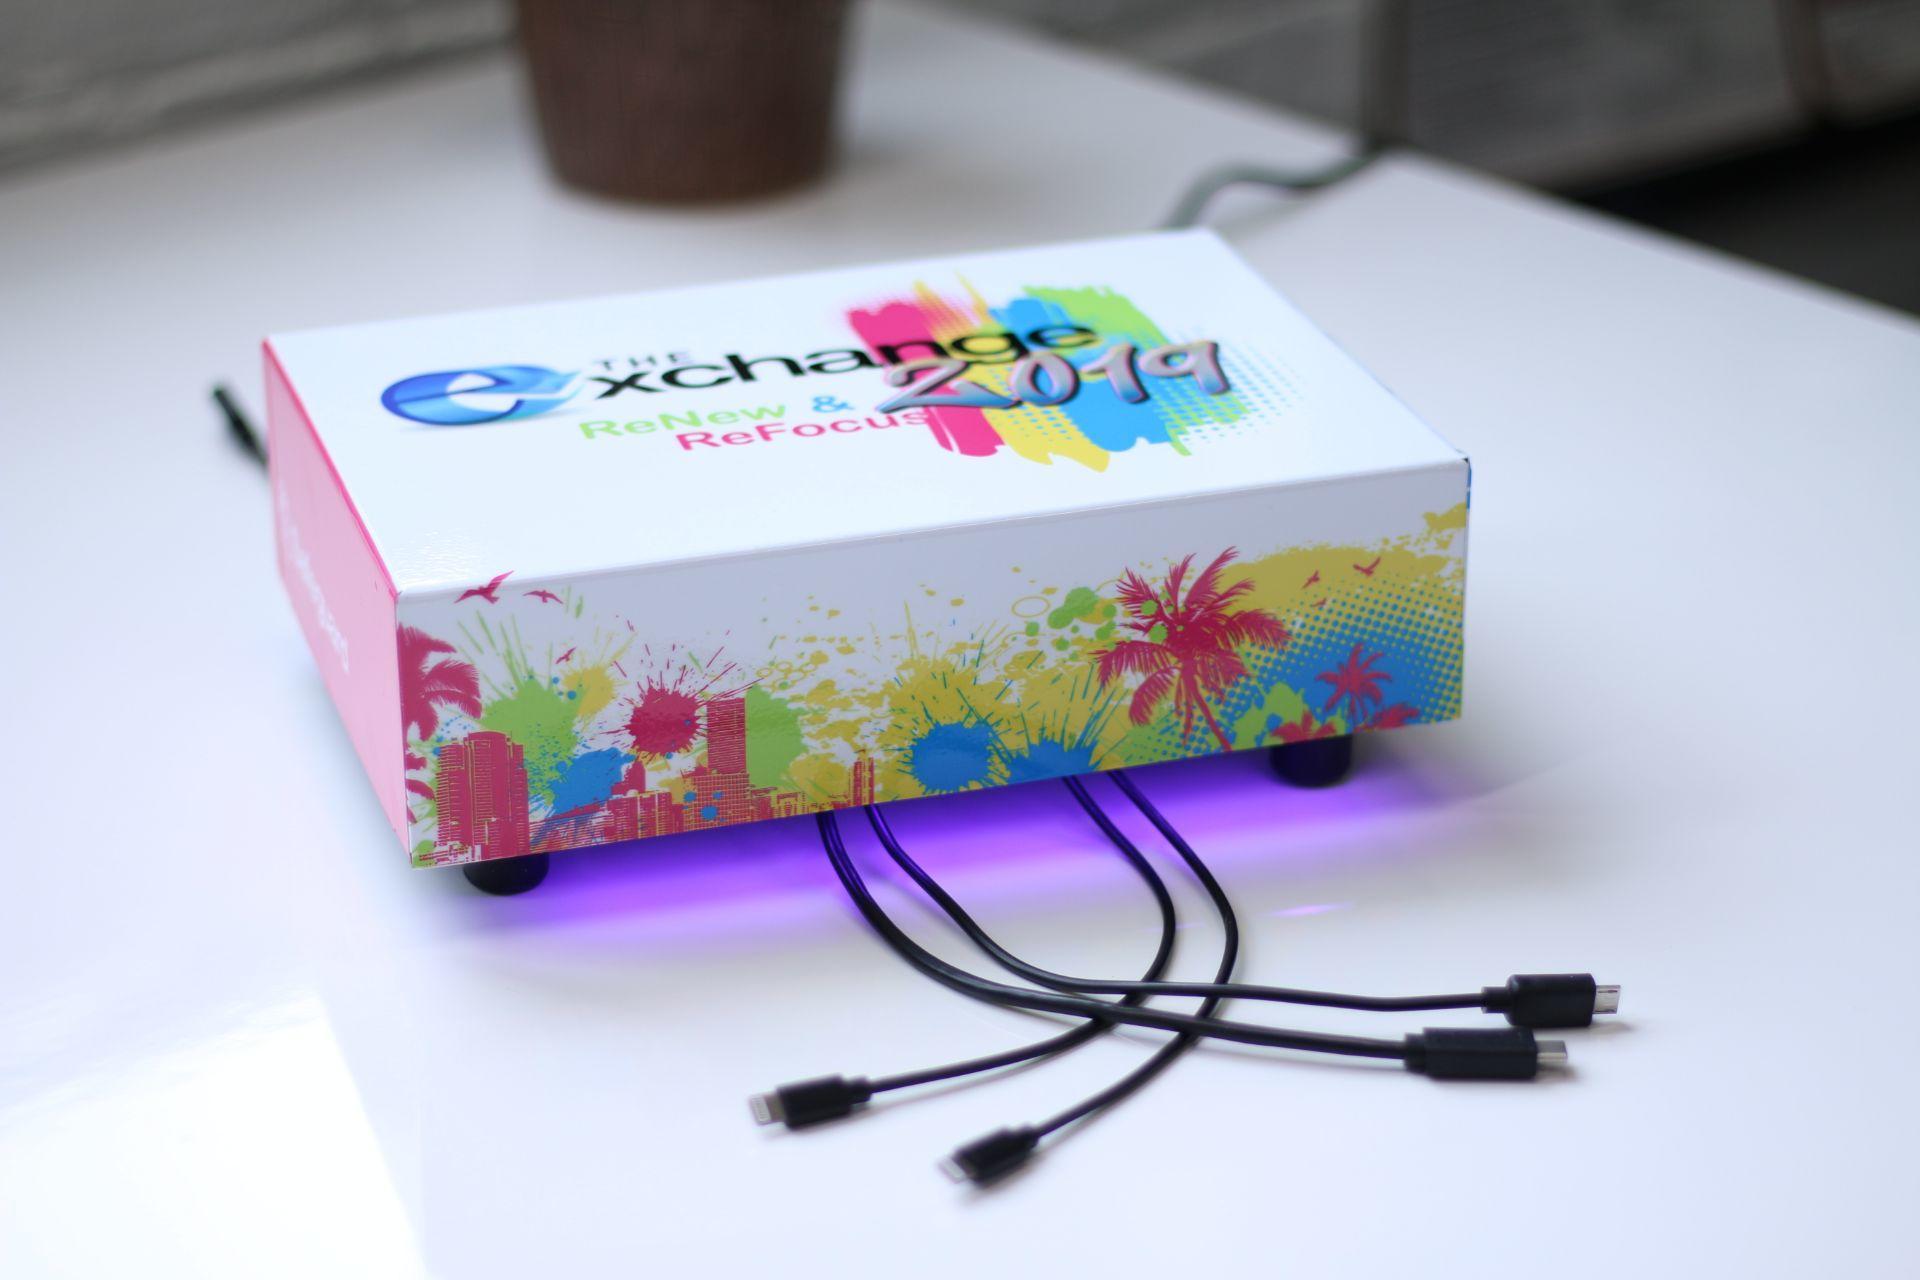 Inbox_portable_charger.jpg